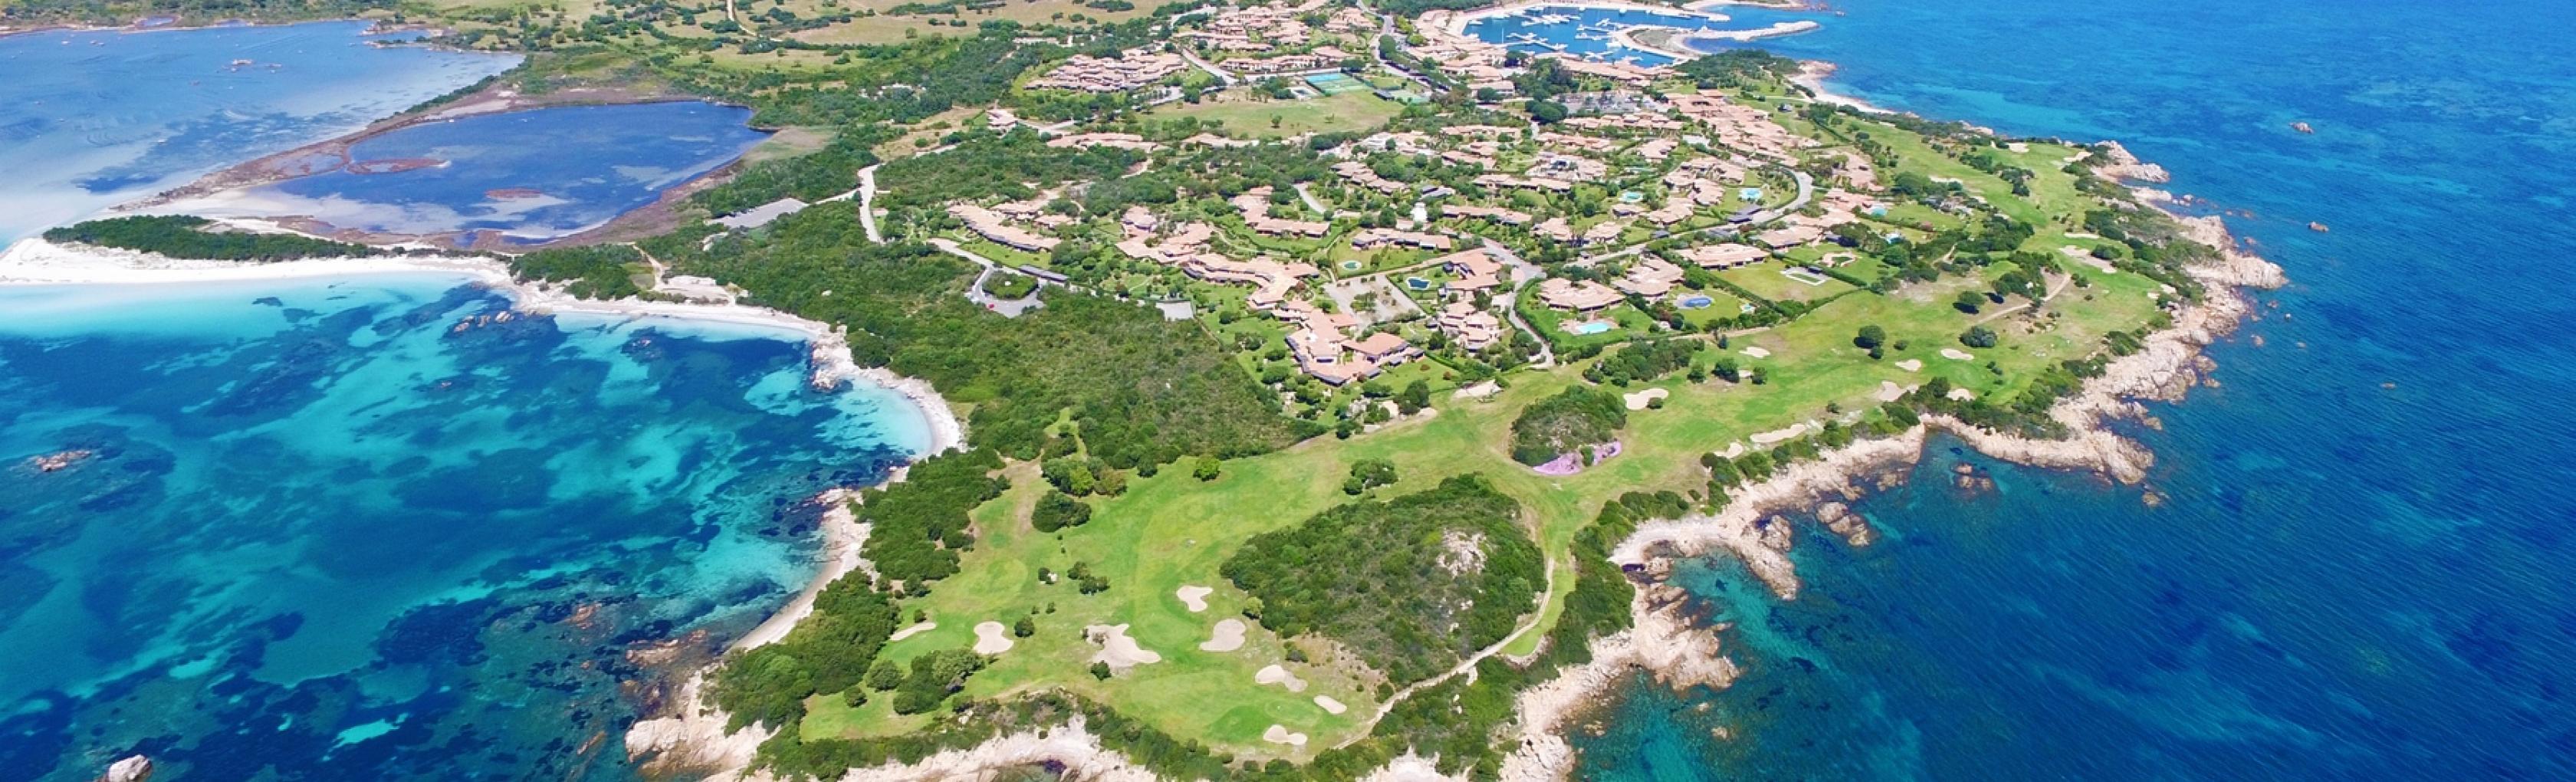 golf&more - puntaldia.jpg